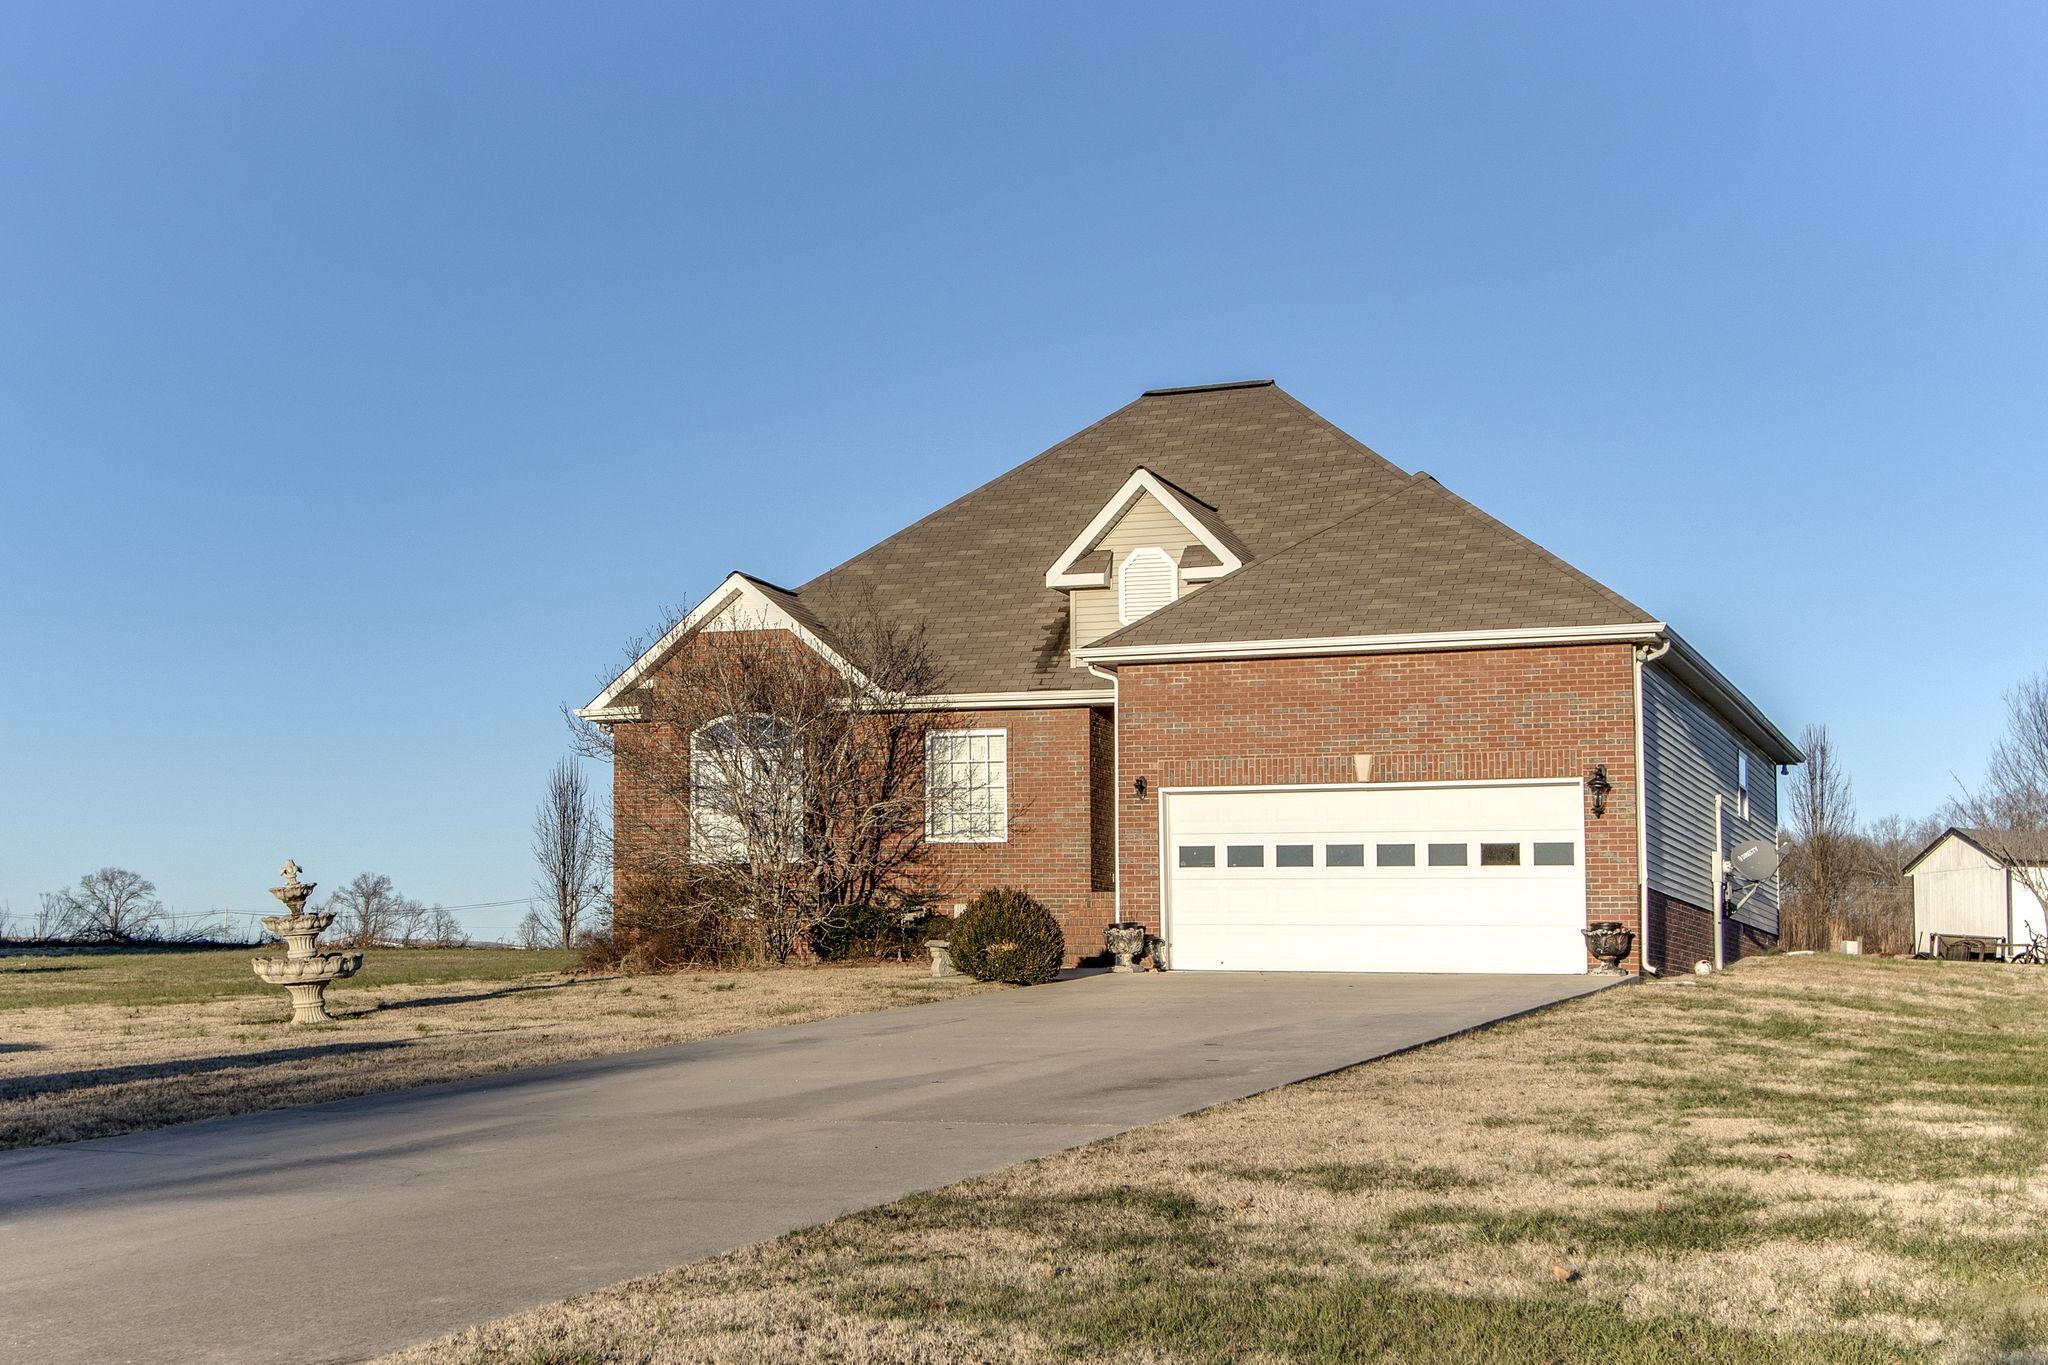 160 Maple Ridge Ct, Mc Minnville, TN 37110 - Mc Minnville, TN real estate listing